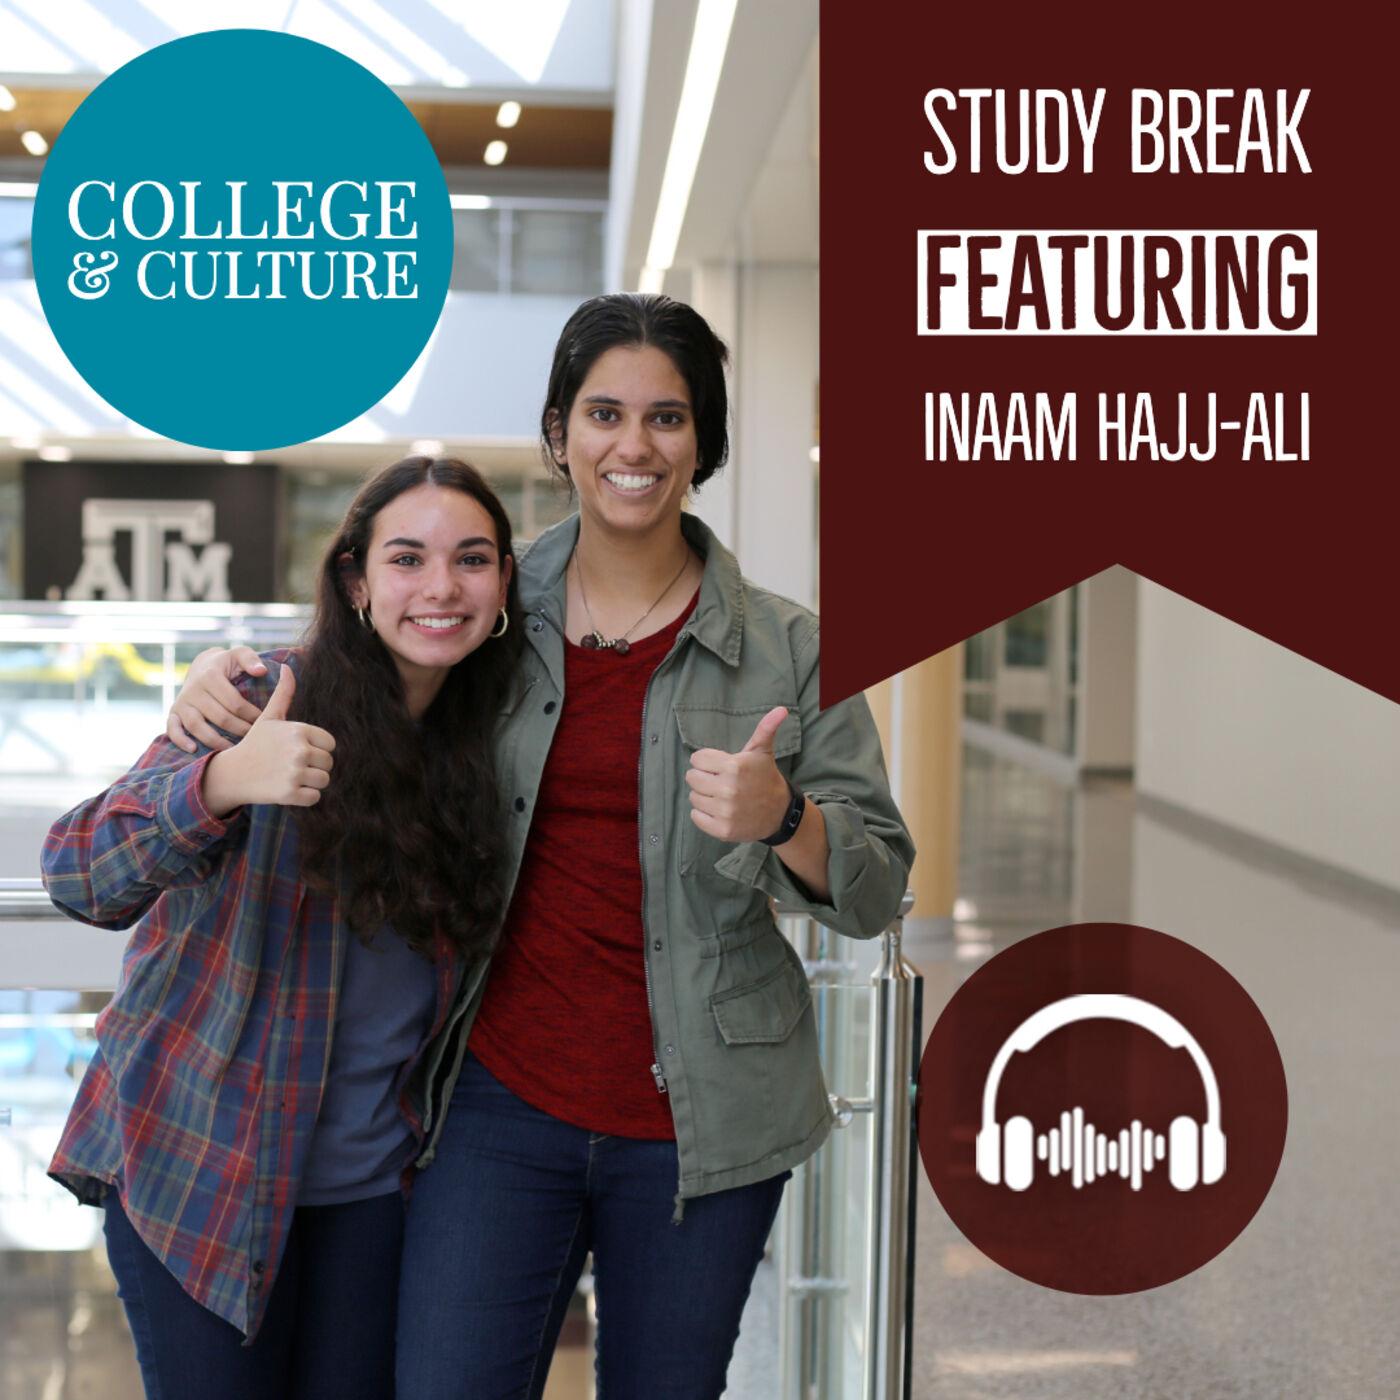 The Study Break: College life for a minority (Featuring Inaam Hajj-Ali)